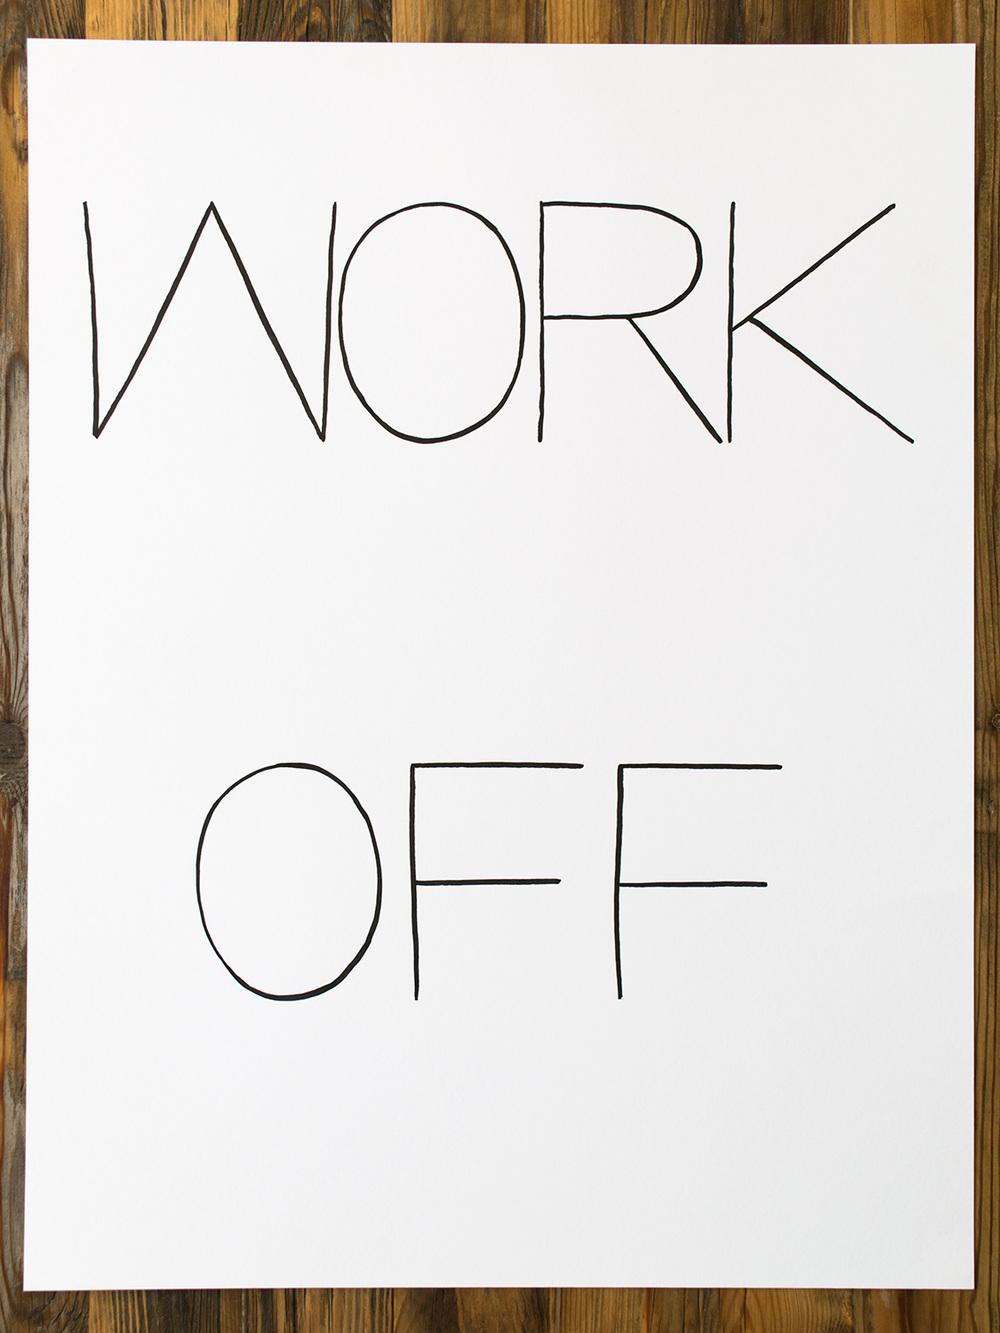 work_off-1500x1125.jpg